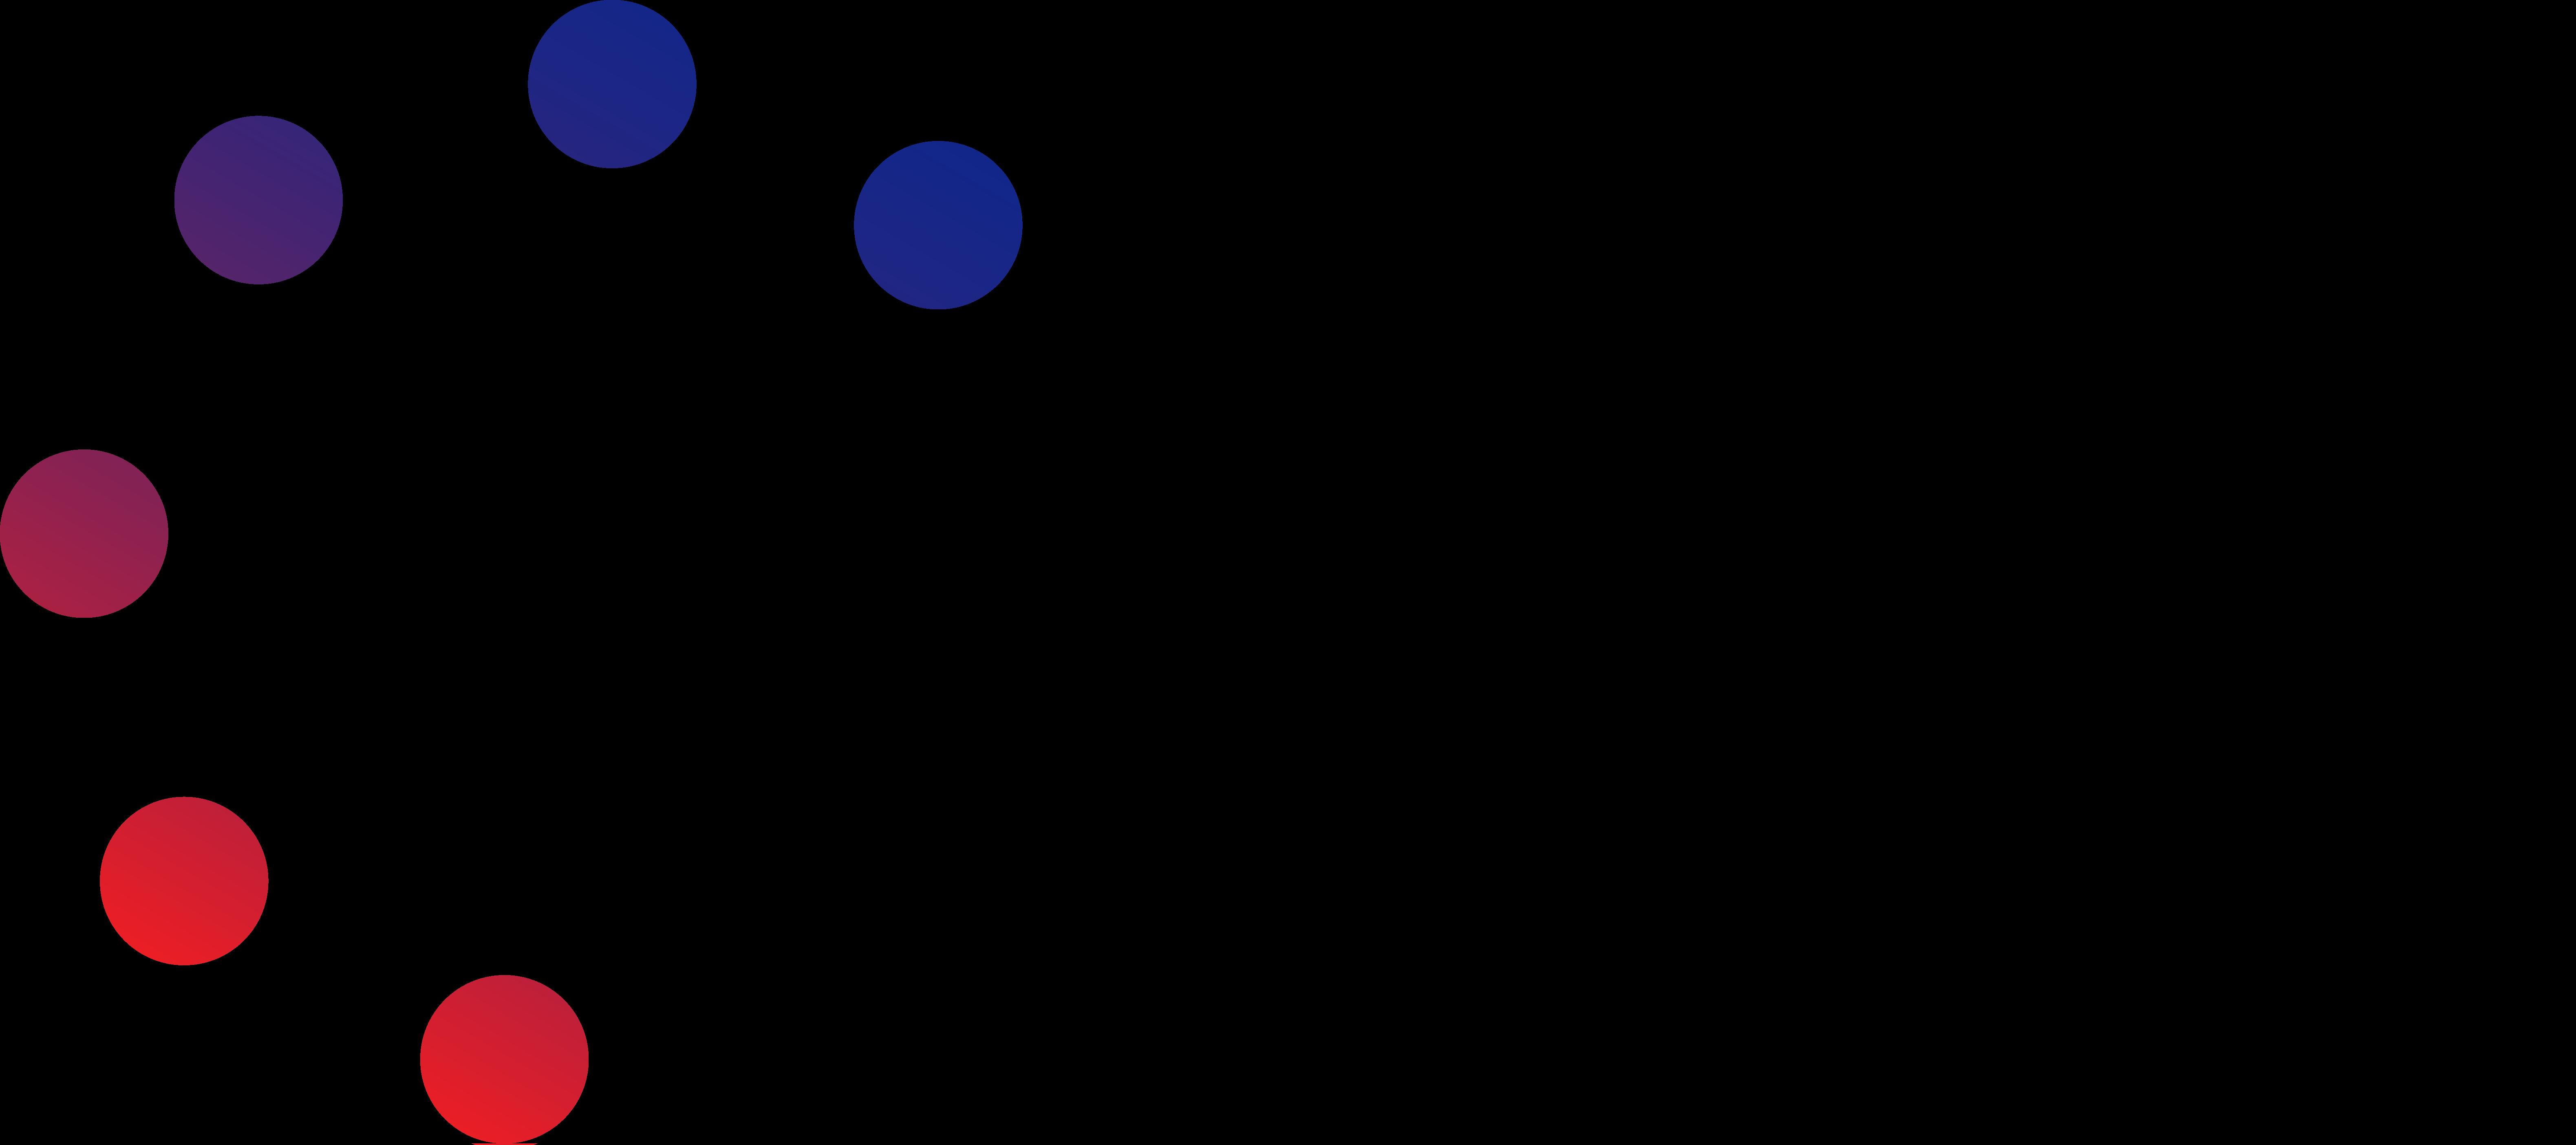 slobodnaeuropa_logo_RGB_transparent